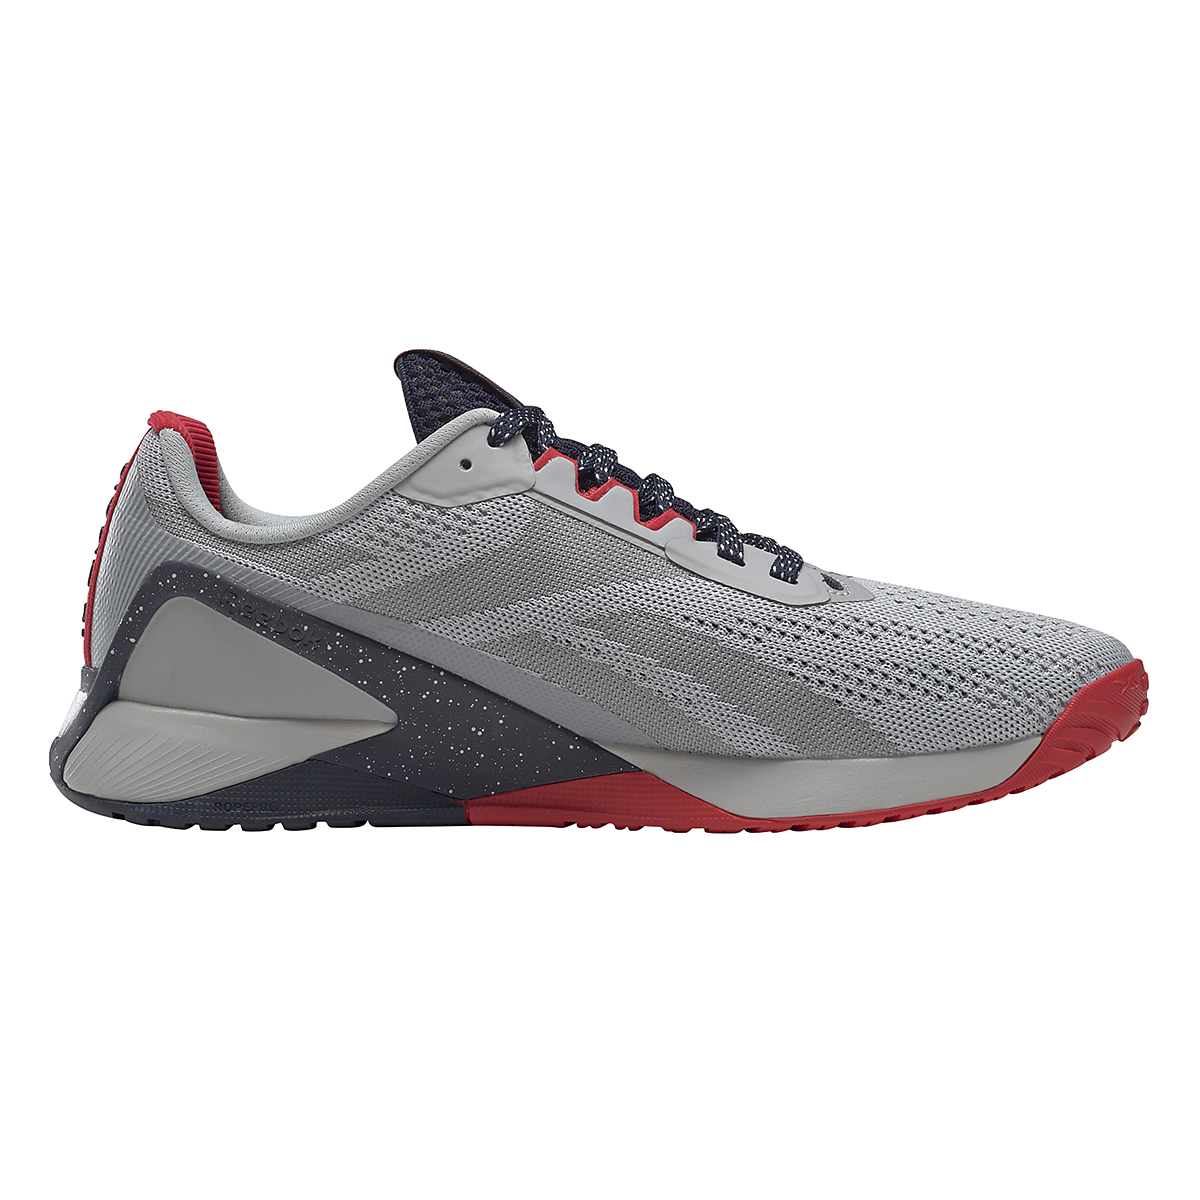 Men's Reebok Nano X1 Training Shoe - Color: Pure Grey/Vector Navy/Vector Red - JackRabbit Exclusive - Size: 8 - Width: Regular, Pure Grey/Vector Navy/Vector Red - JackRabbit Exclusive, large, image 4